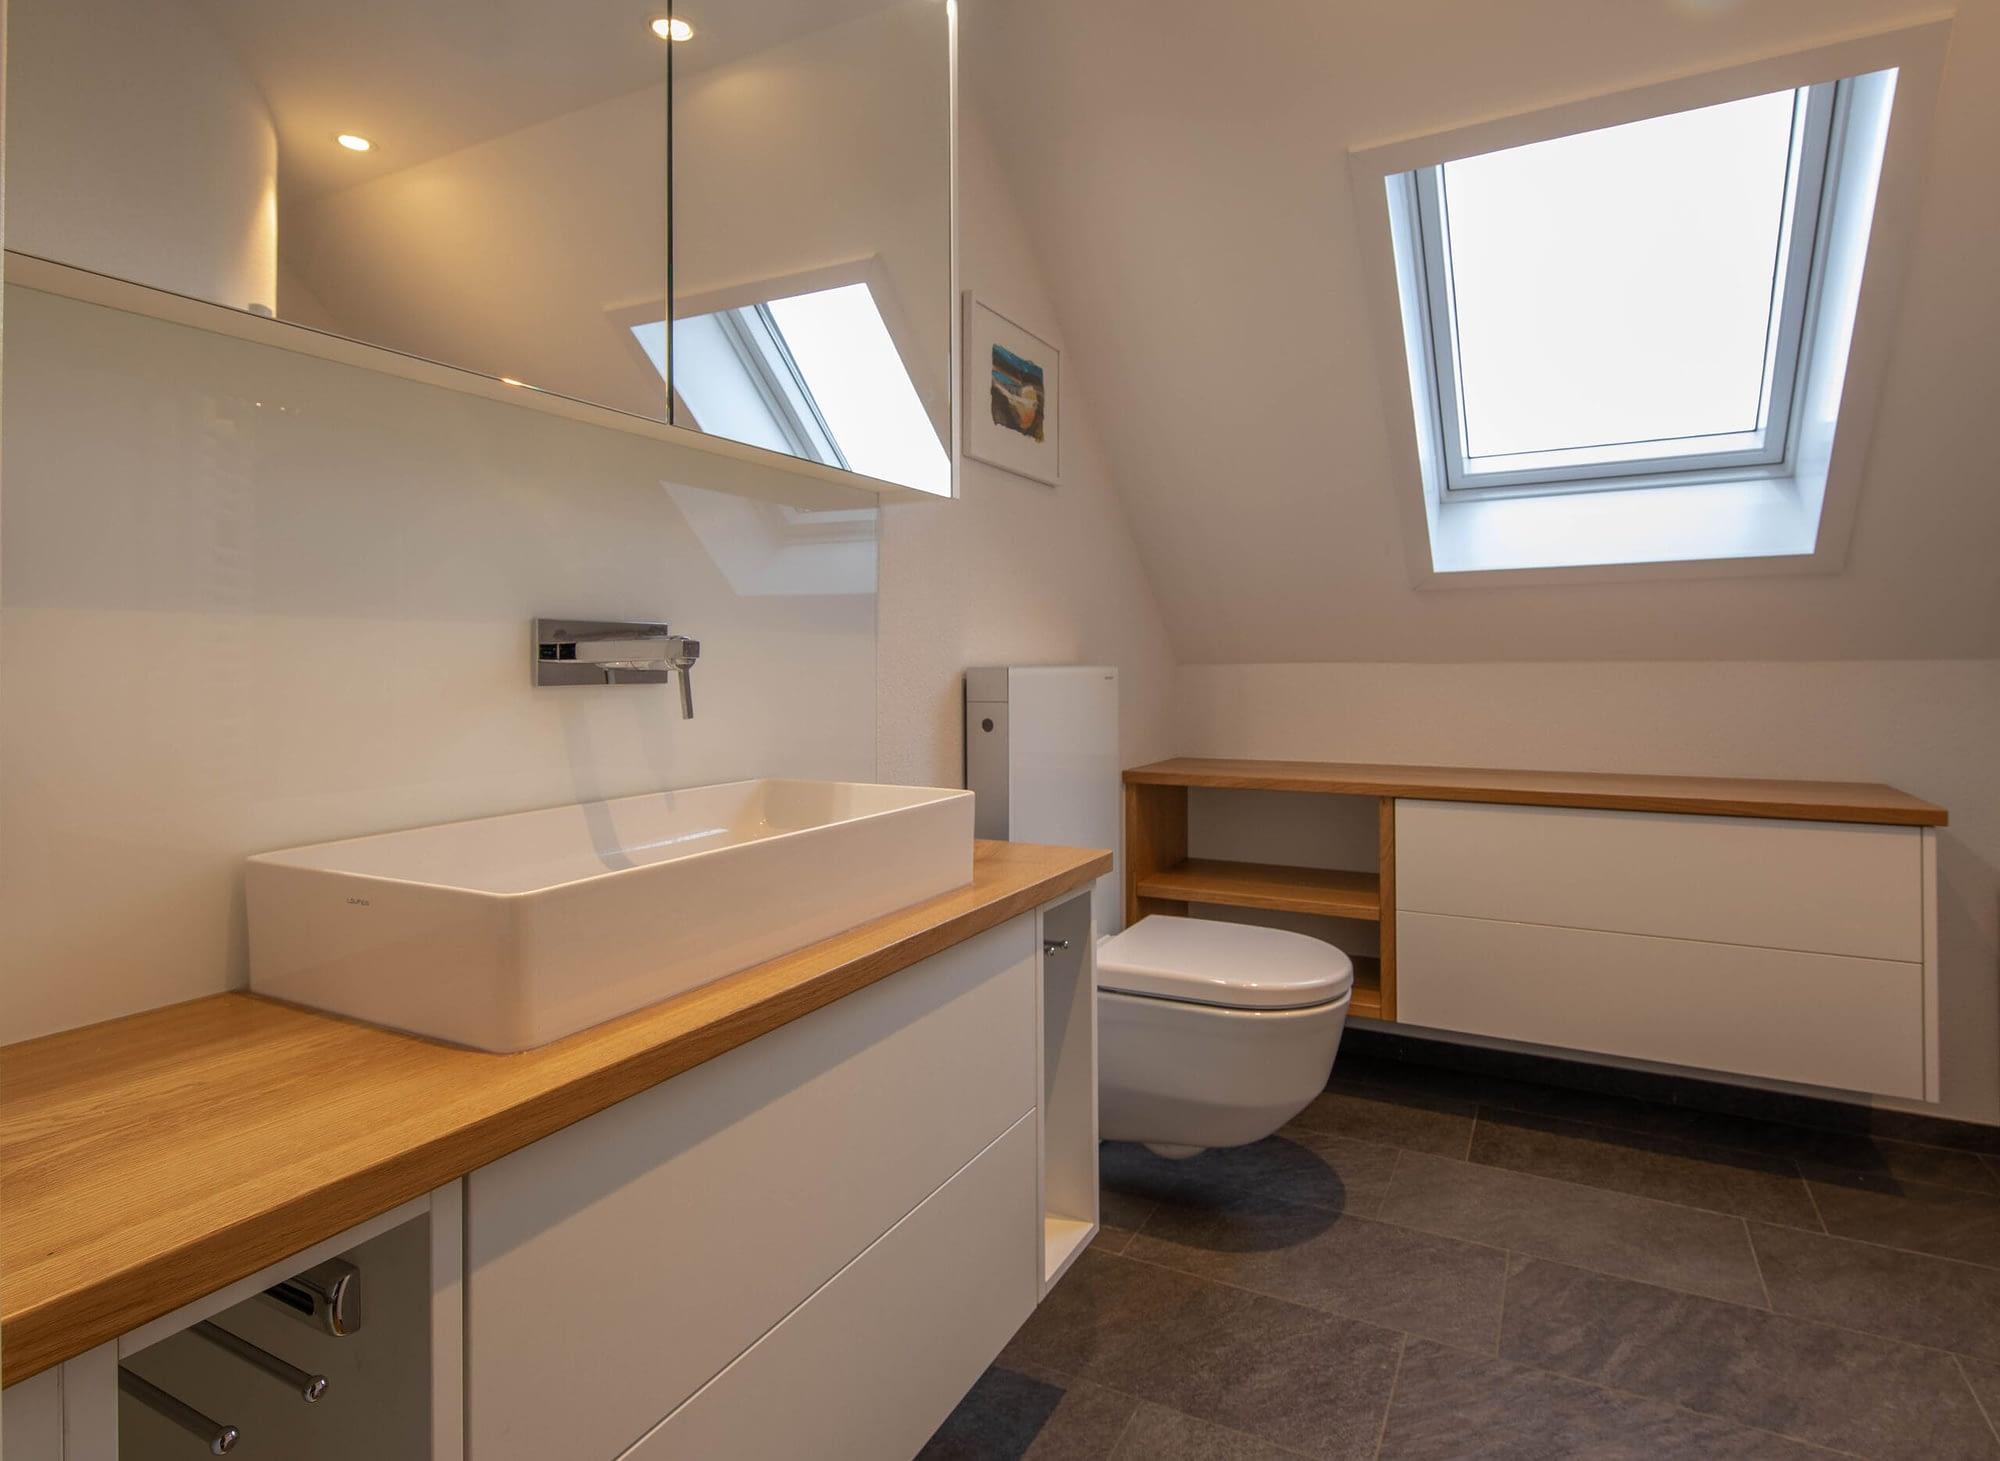 Badezimmer Oberflächenausstattung aus Holz